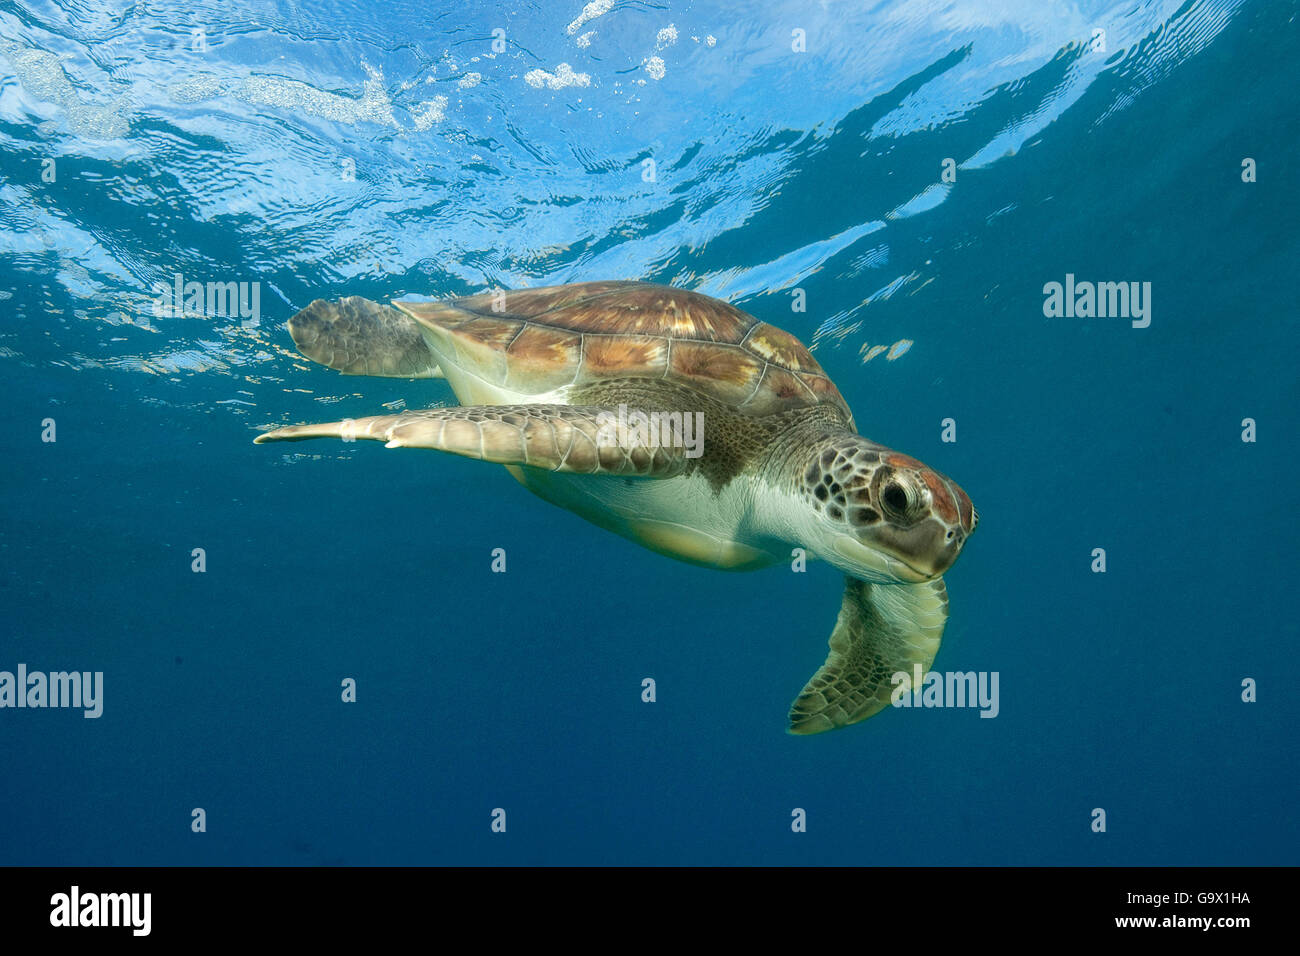 hawksbill sea turtle, Canary Islands, Spain,  Europe, Atlantic / (Eretmochelys imbricata) - Stock Image